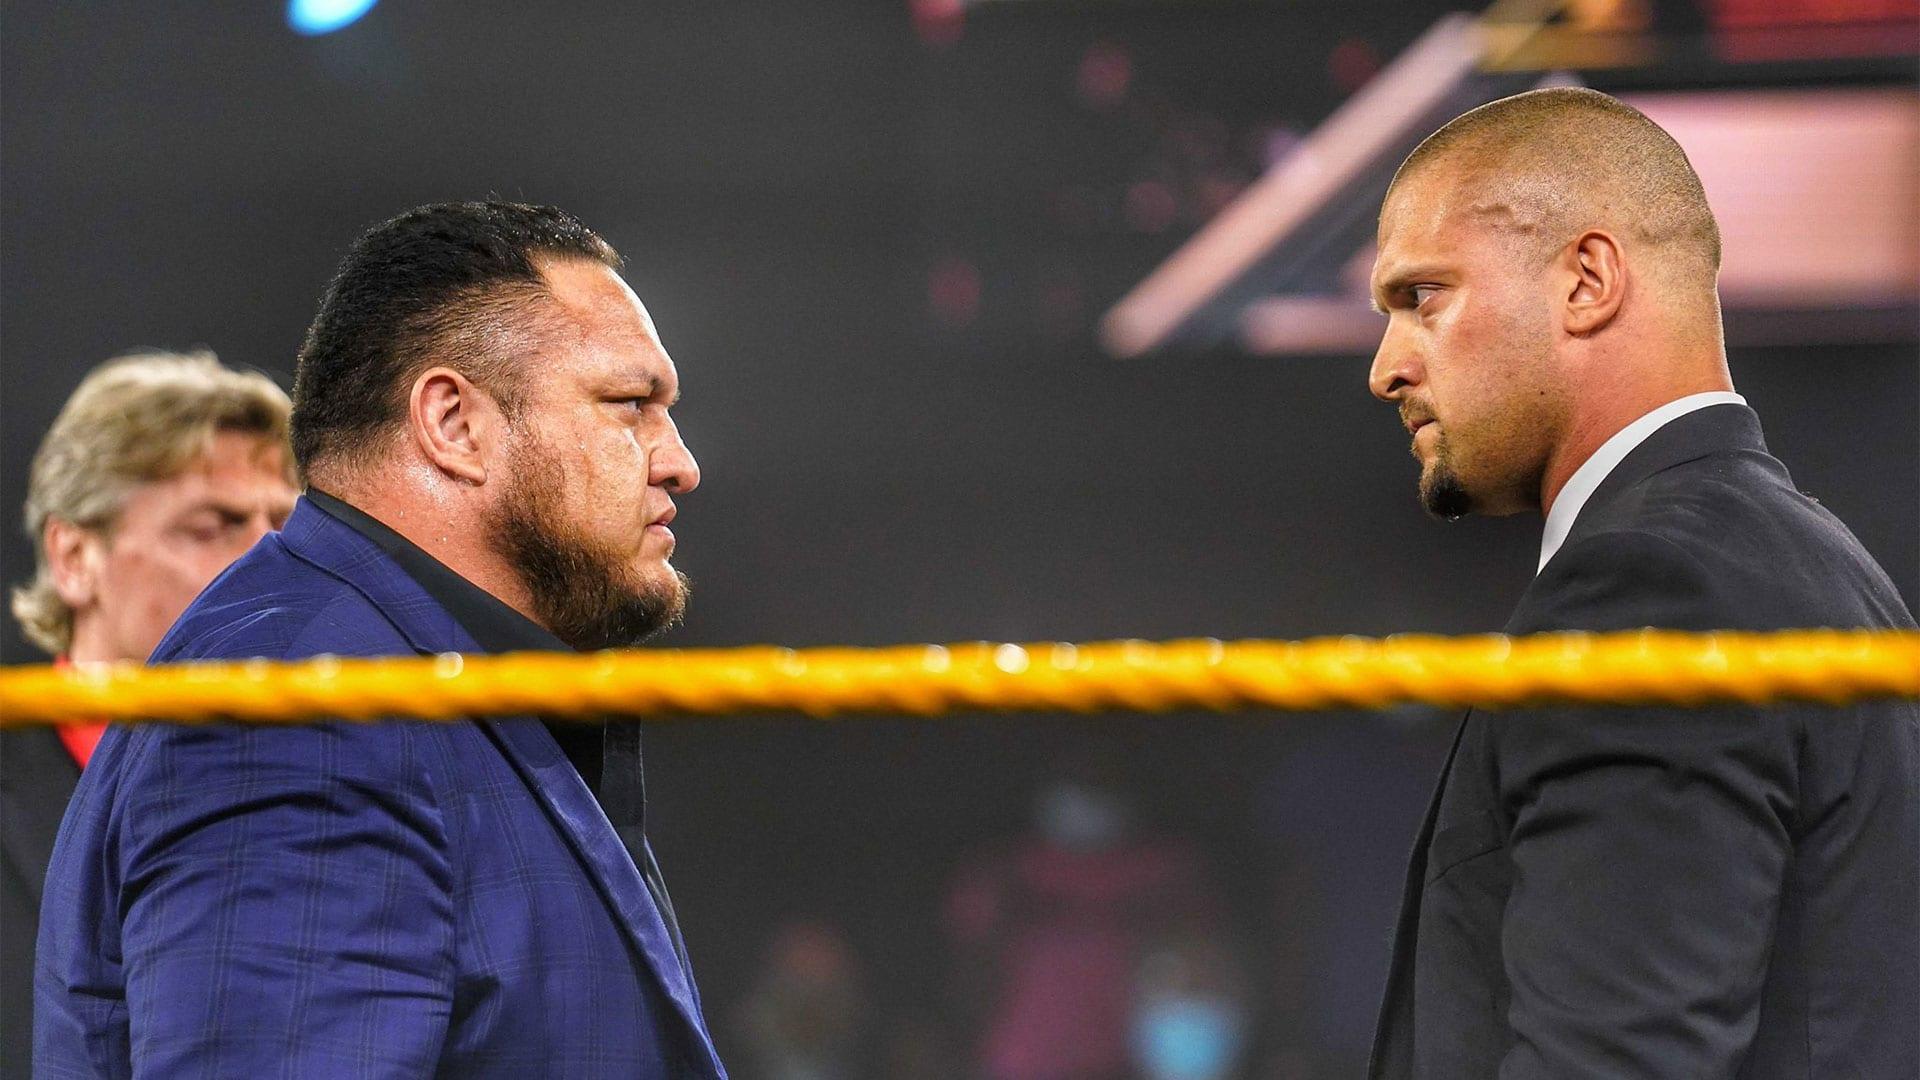 WWE, Rage in a Cage, Thunderdome, Samoa Joe, wrestling